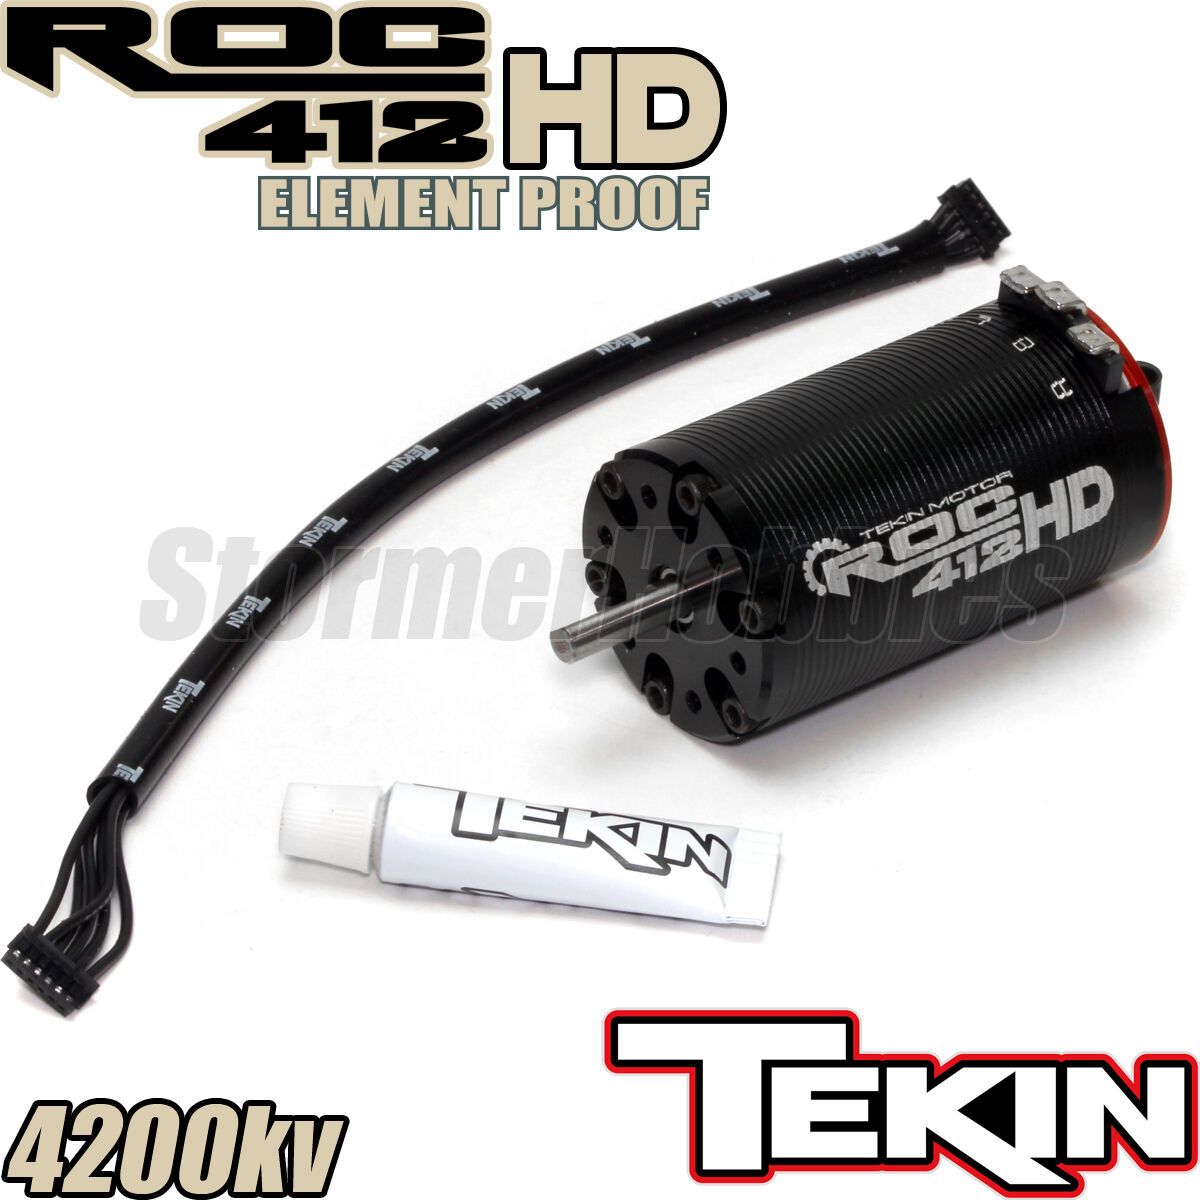 Tekin ROC412 HD Element Proof Sensorosso Brushless Crawler Motor, 4200KV TEKTT2630